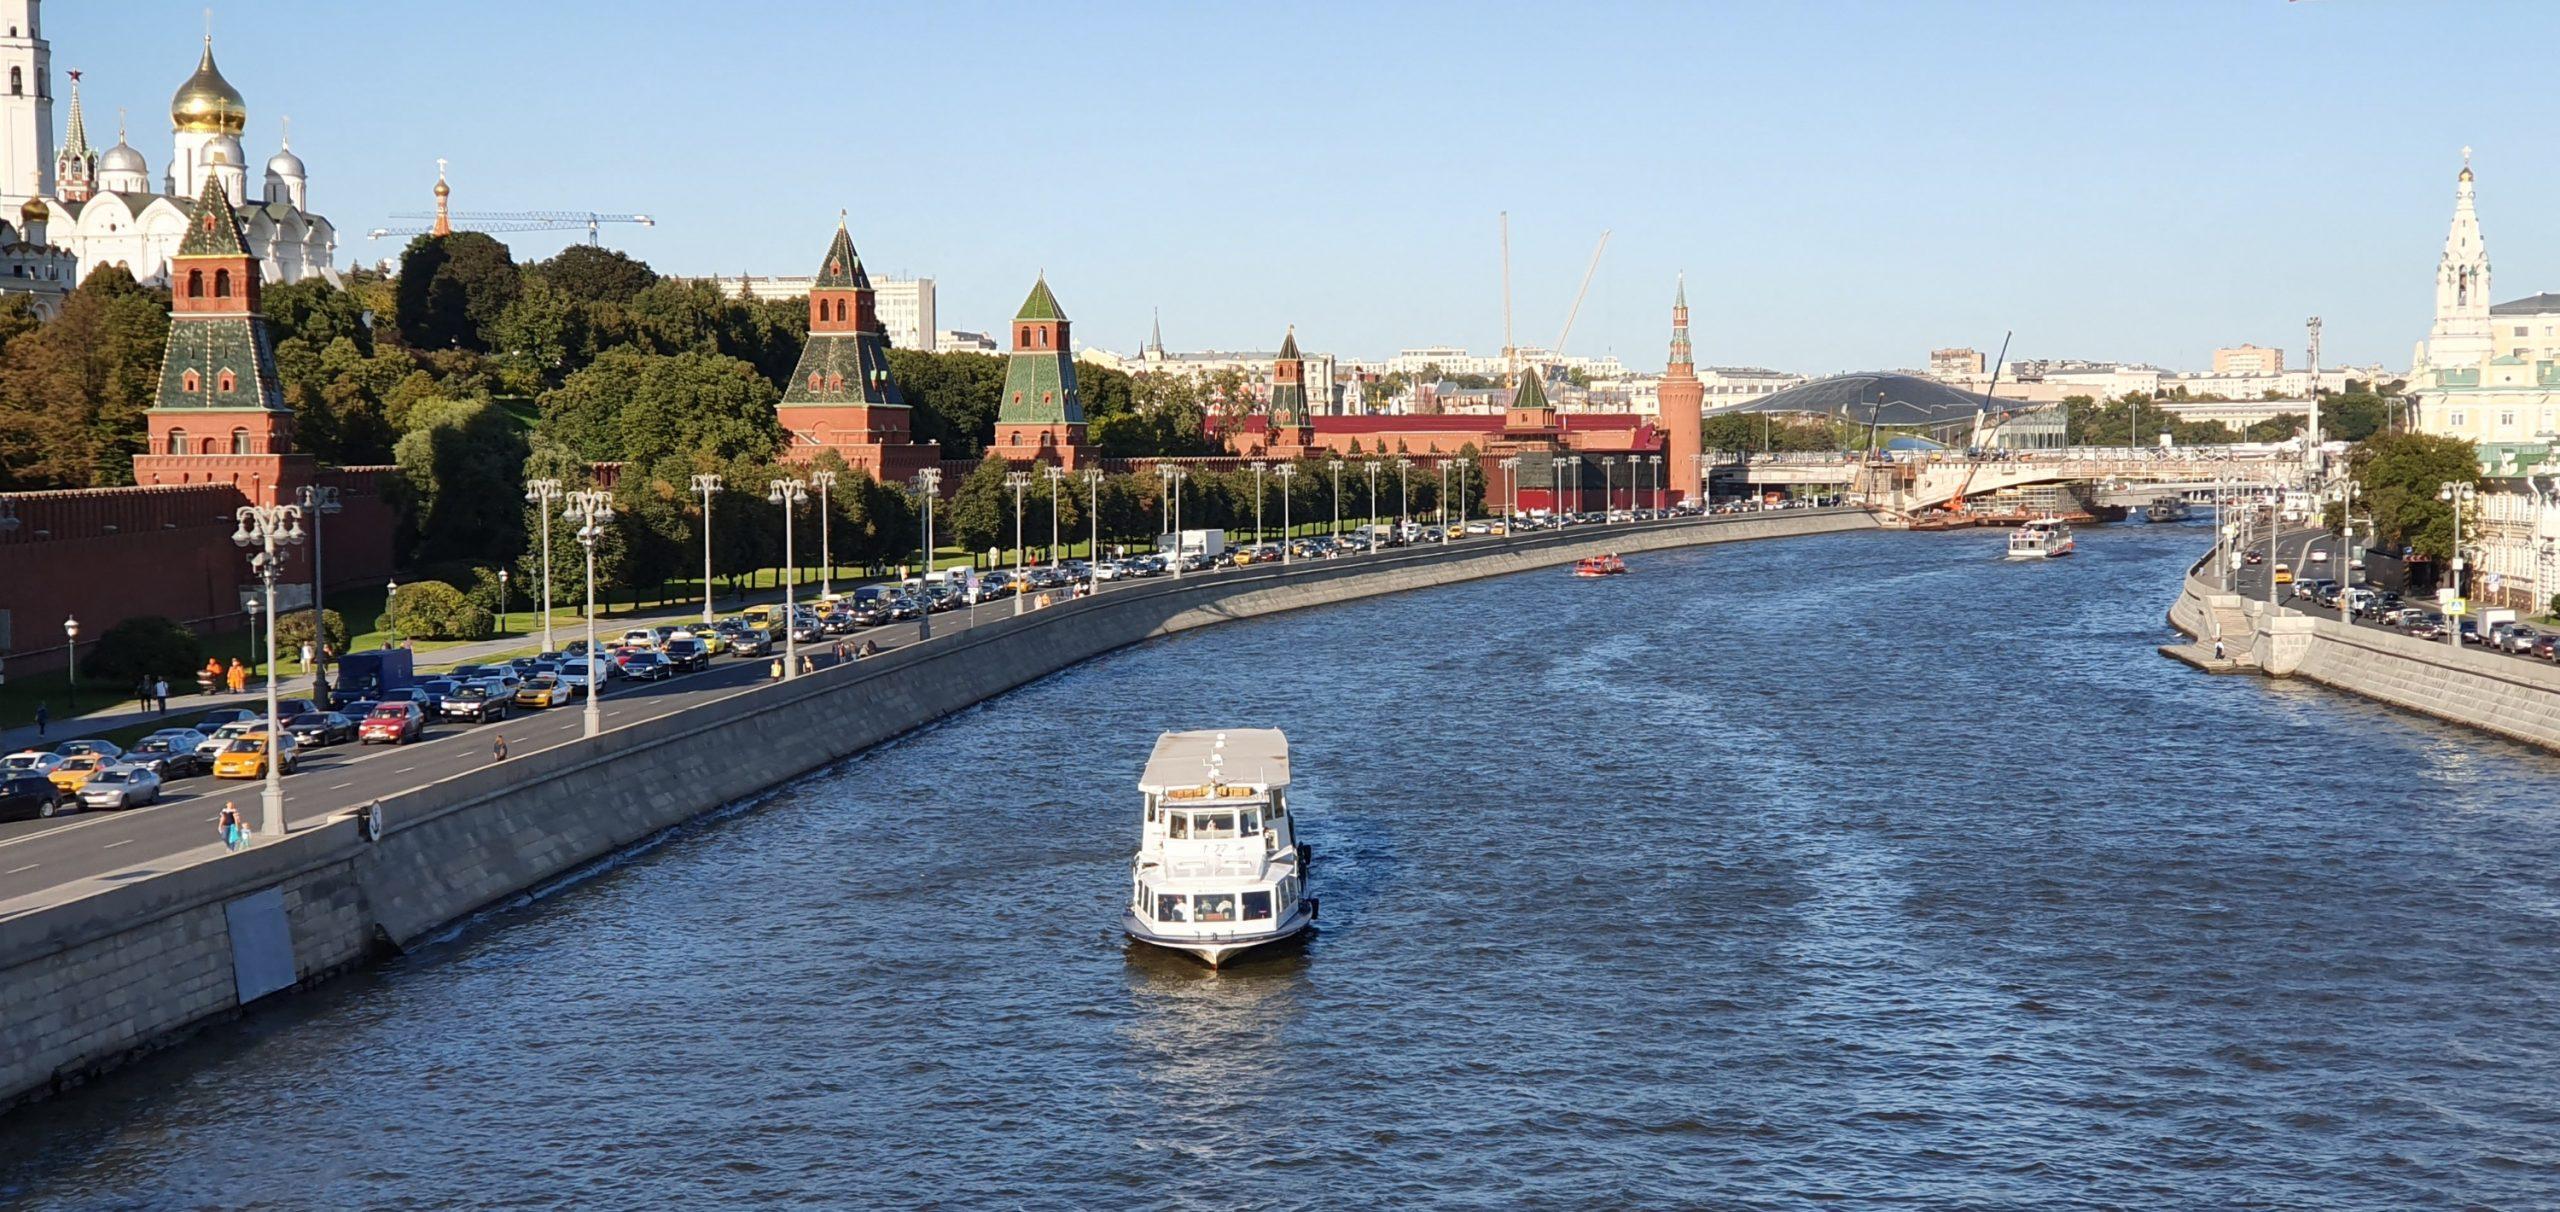 28 août : Moscou - jour 4